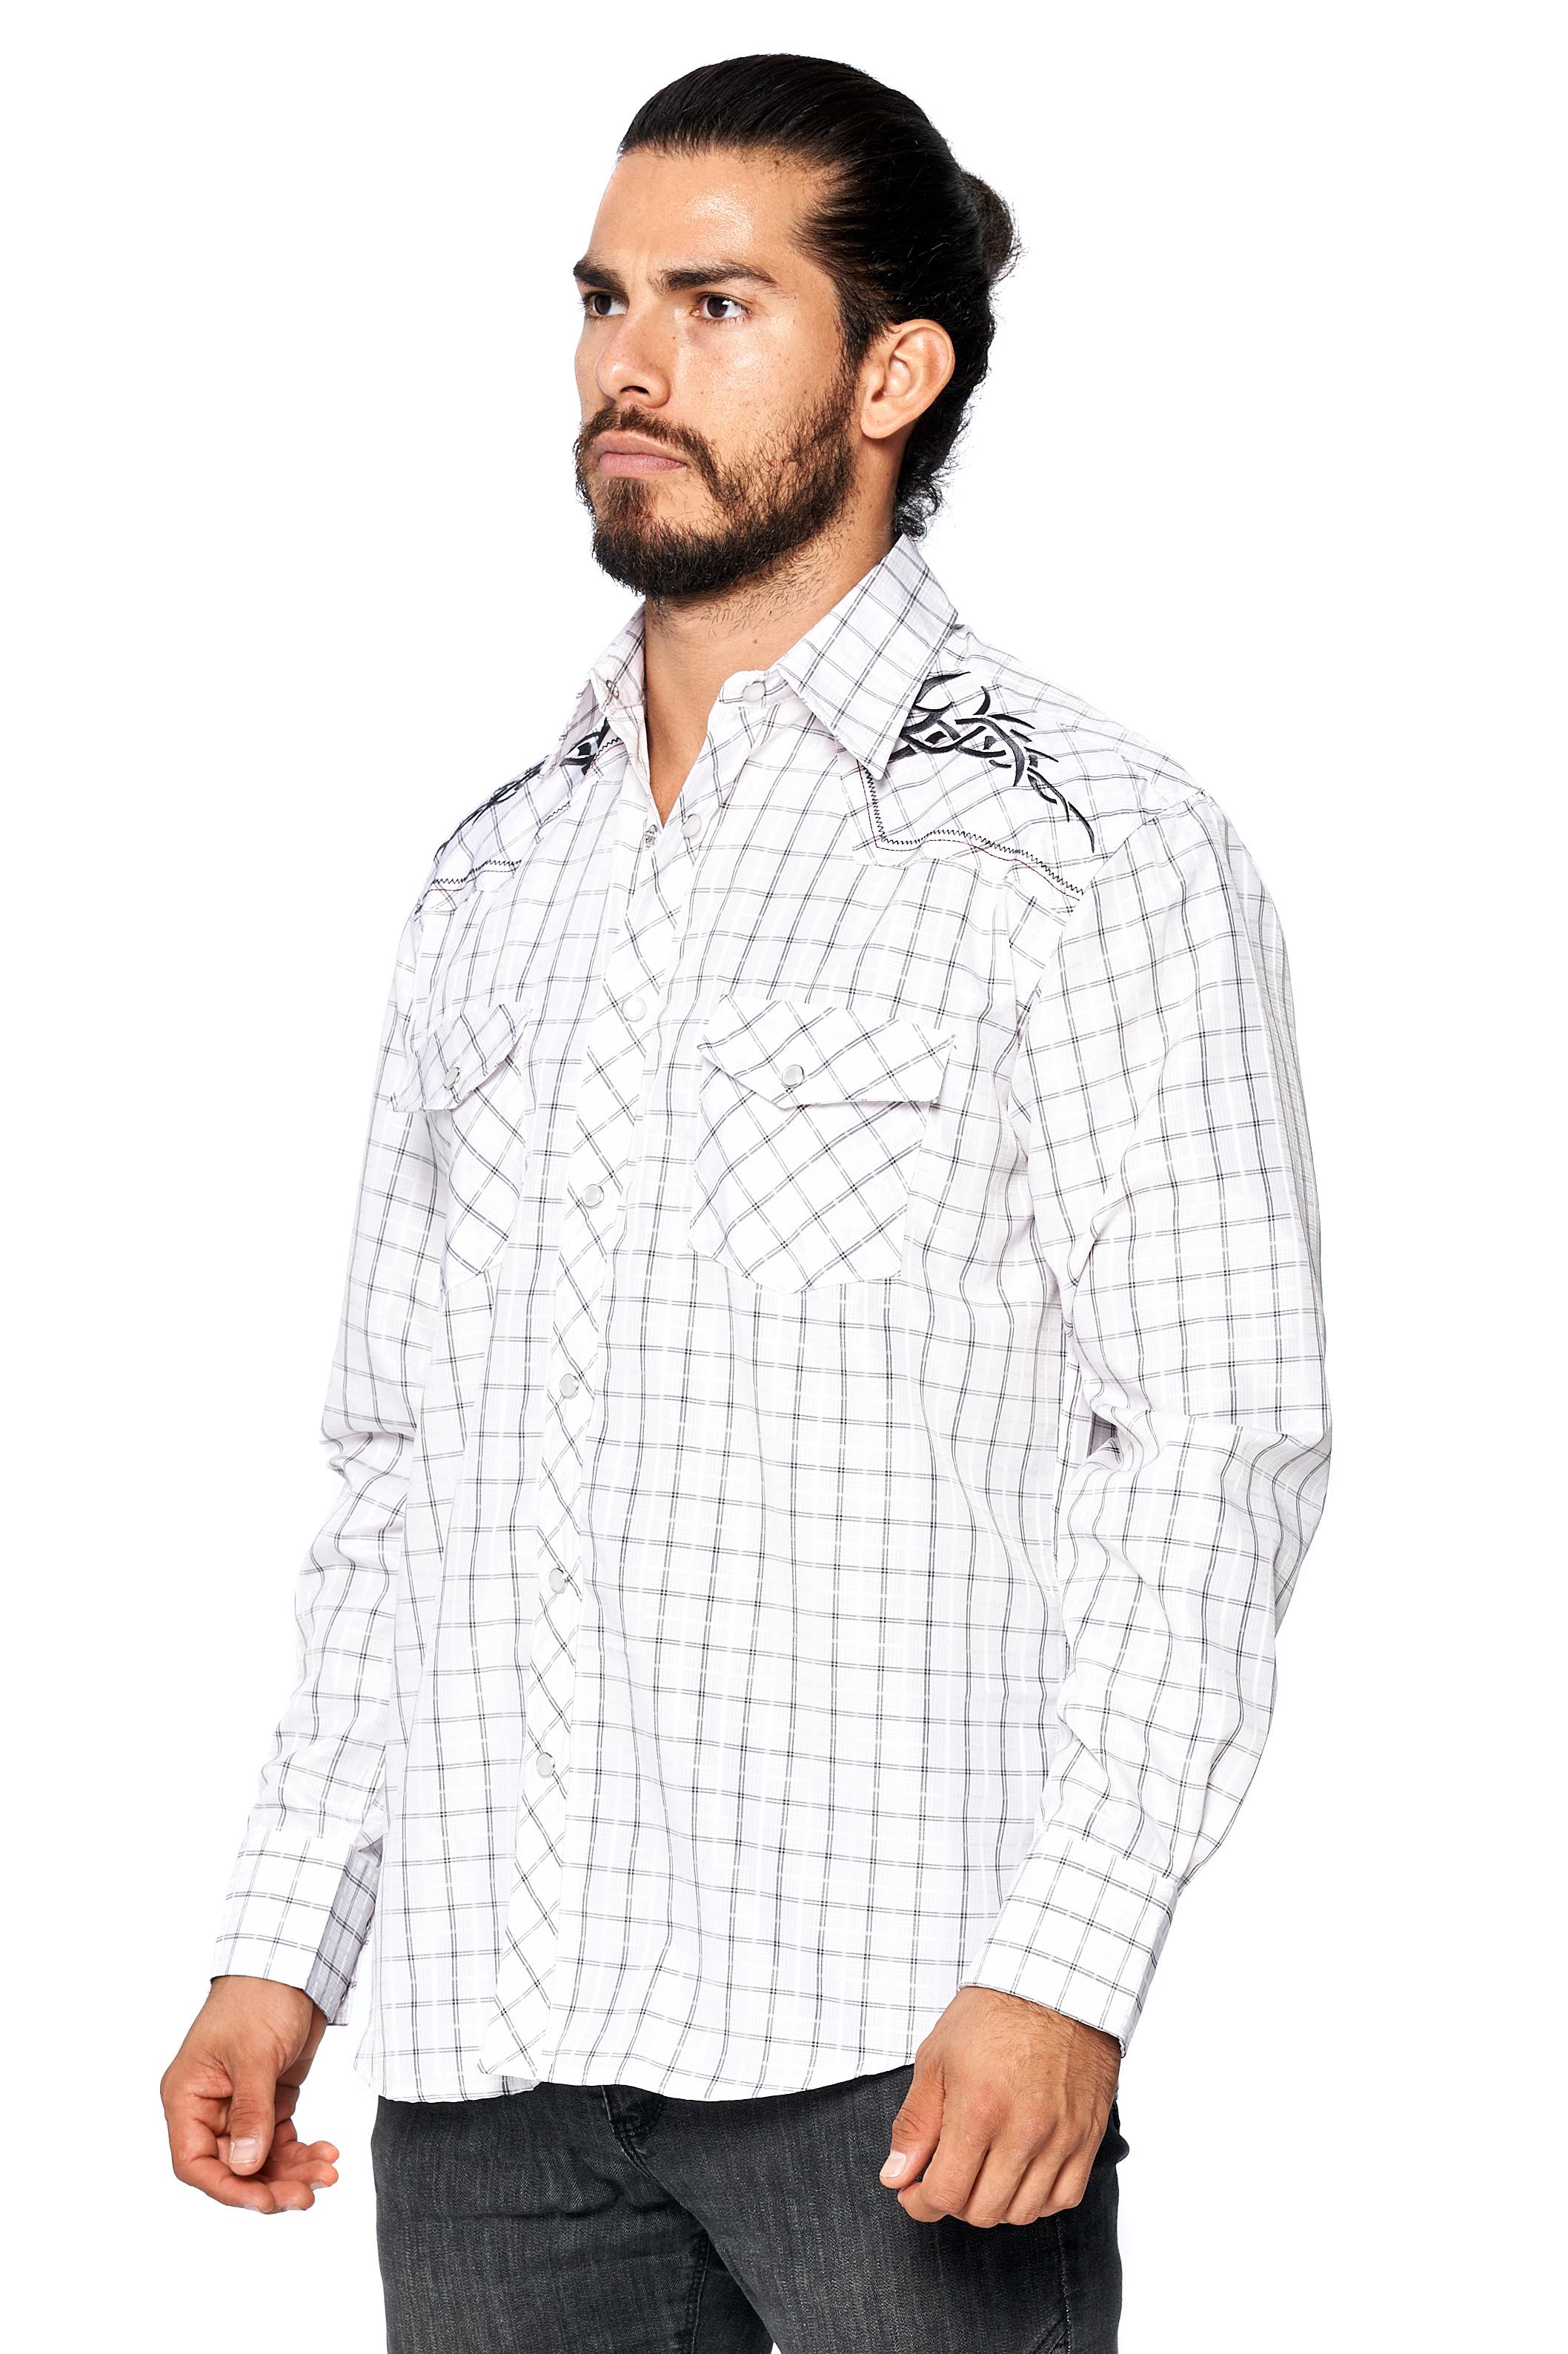 LW-Men-039-s-Pearl-Snap-Tribal-Stylish-Printed-Woven-Western-Vaquero-Rodeo-Shirt thumbnail 72